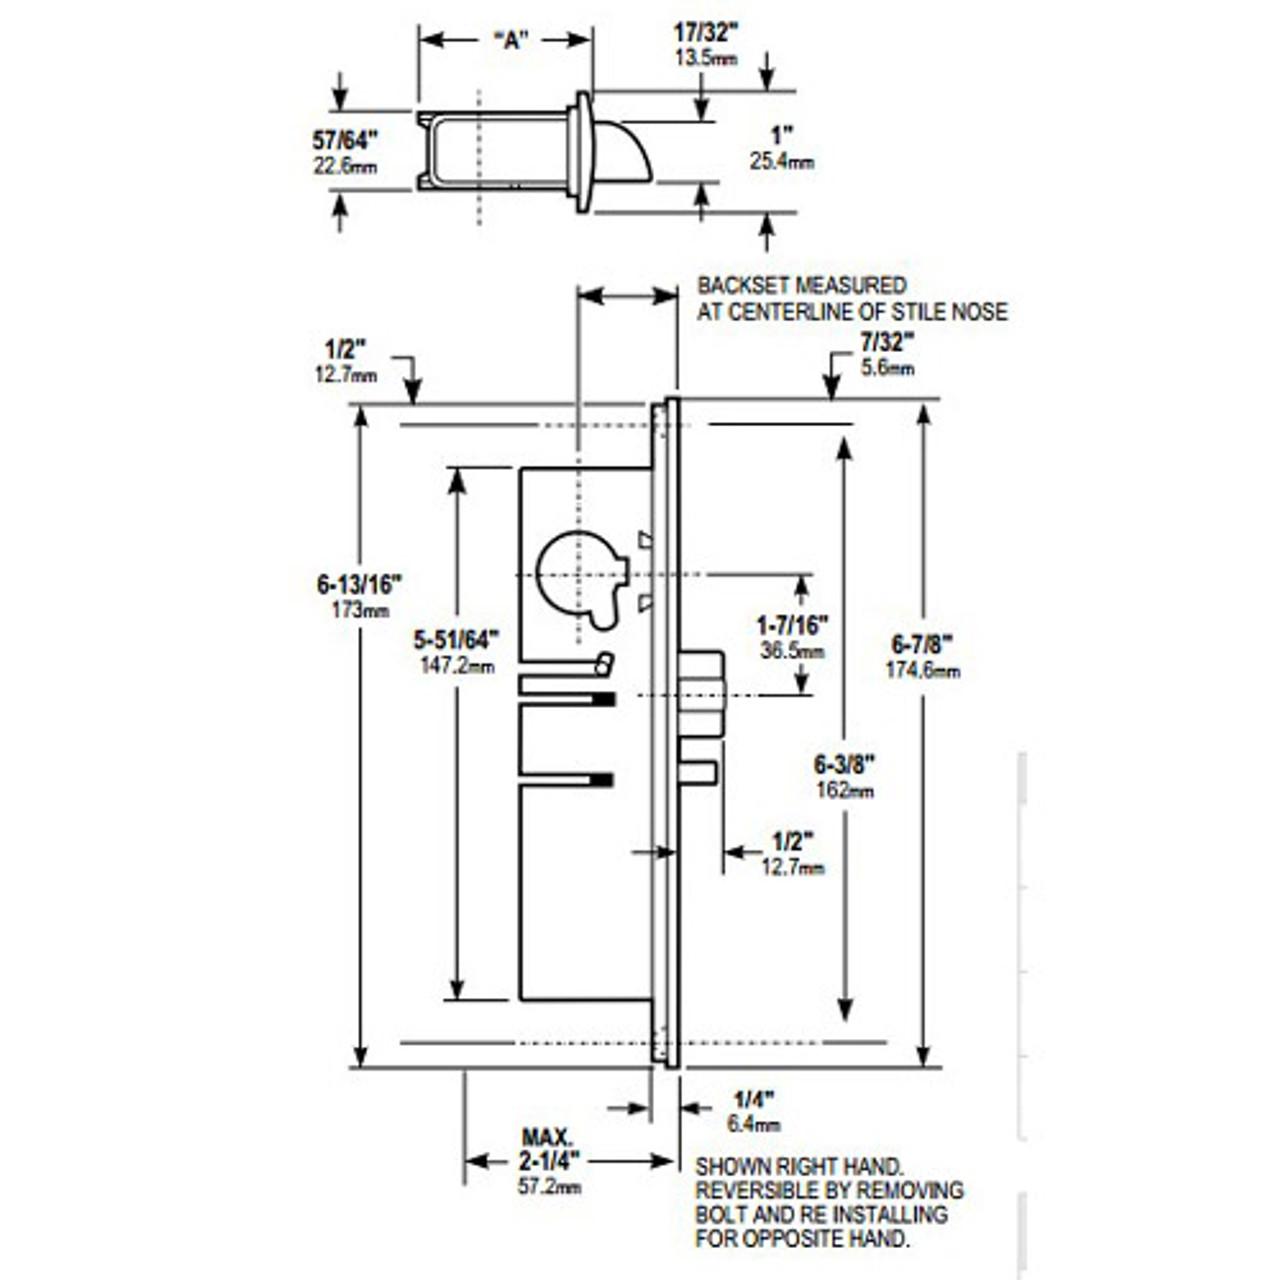 4510-16-202-628 Adams Rite Standard Deadlatch Dimensional View